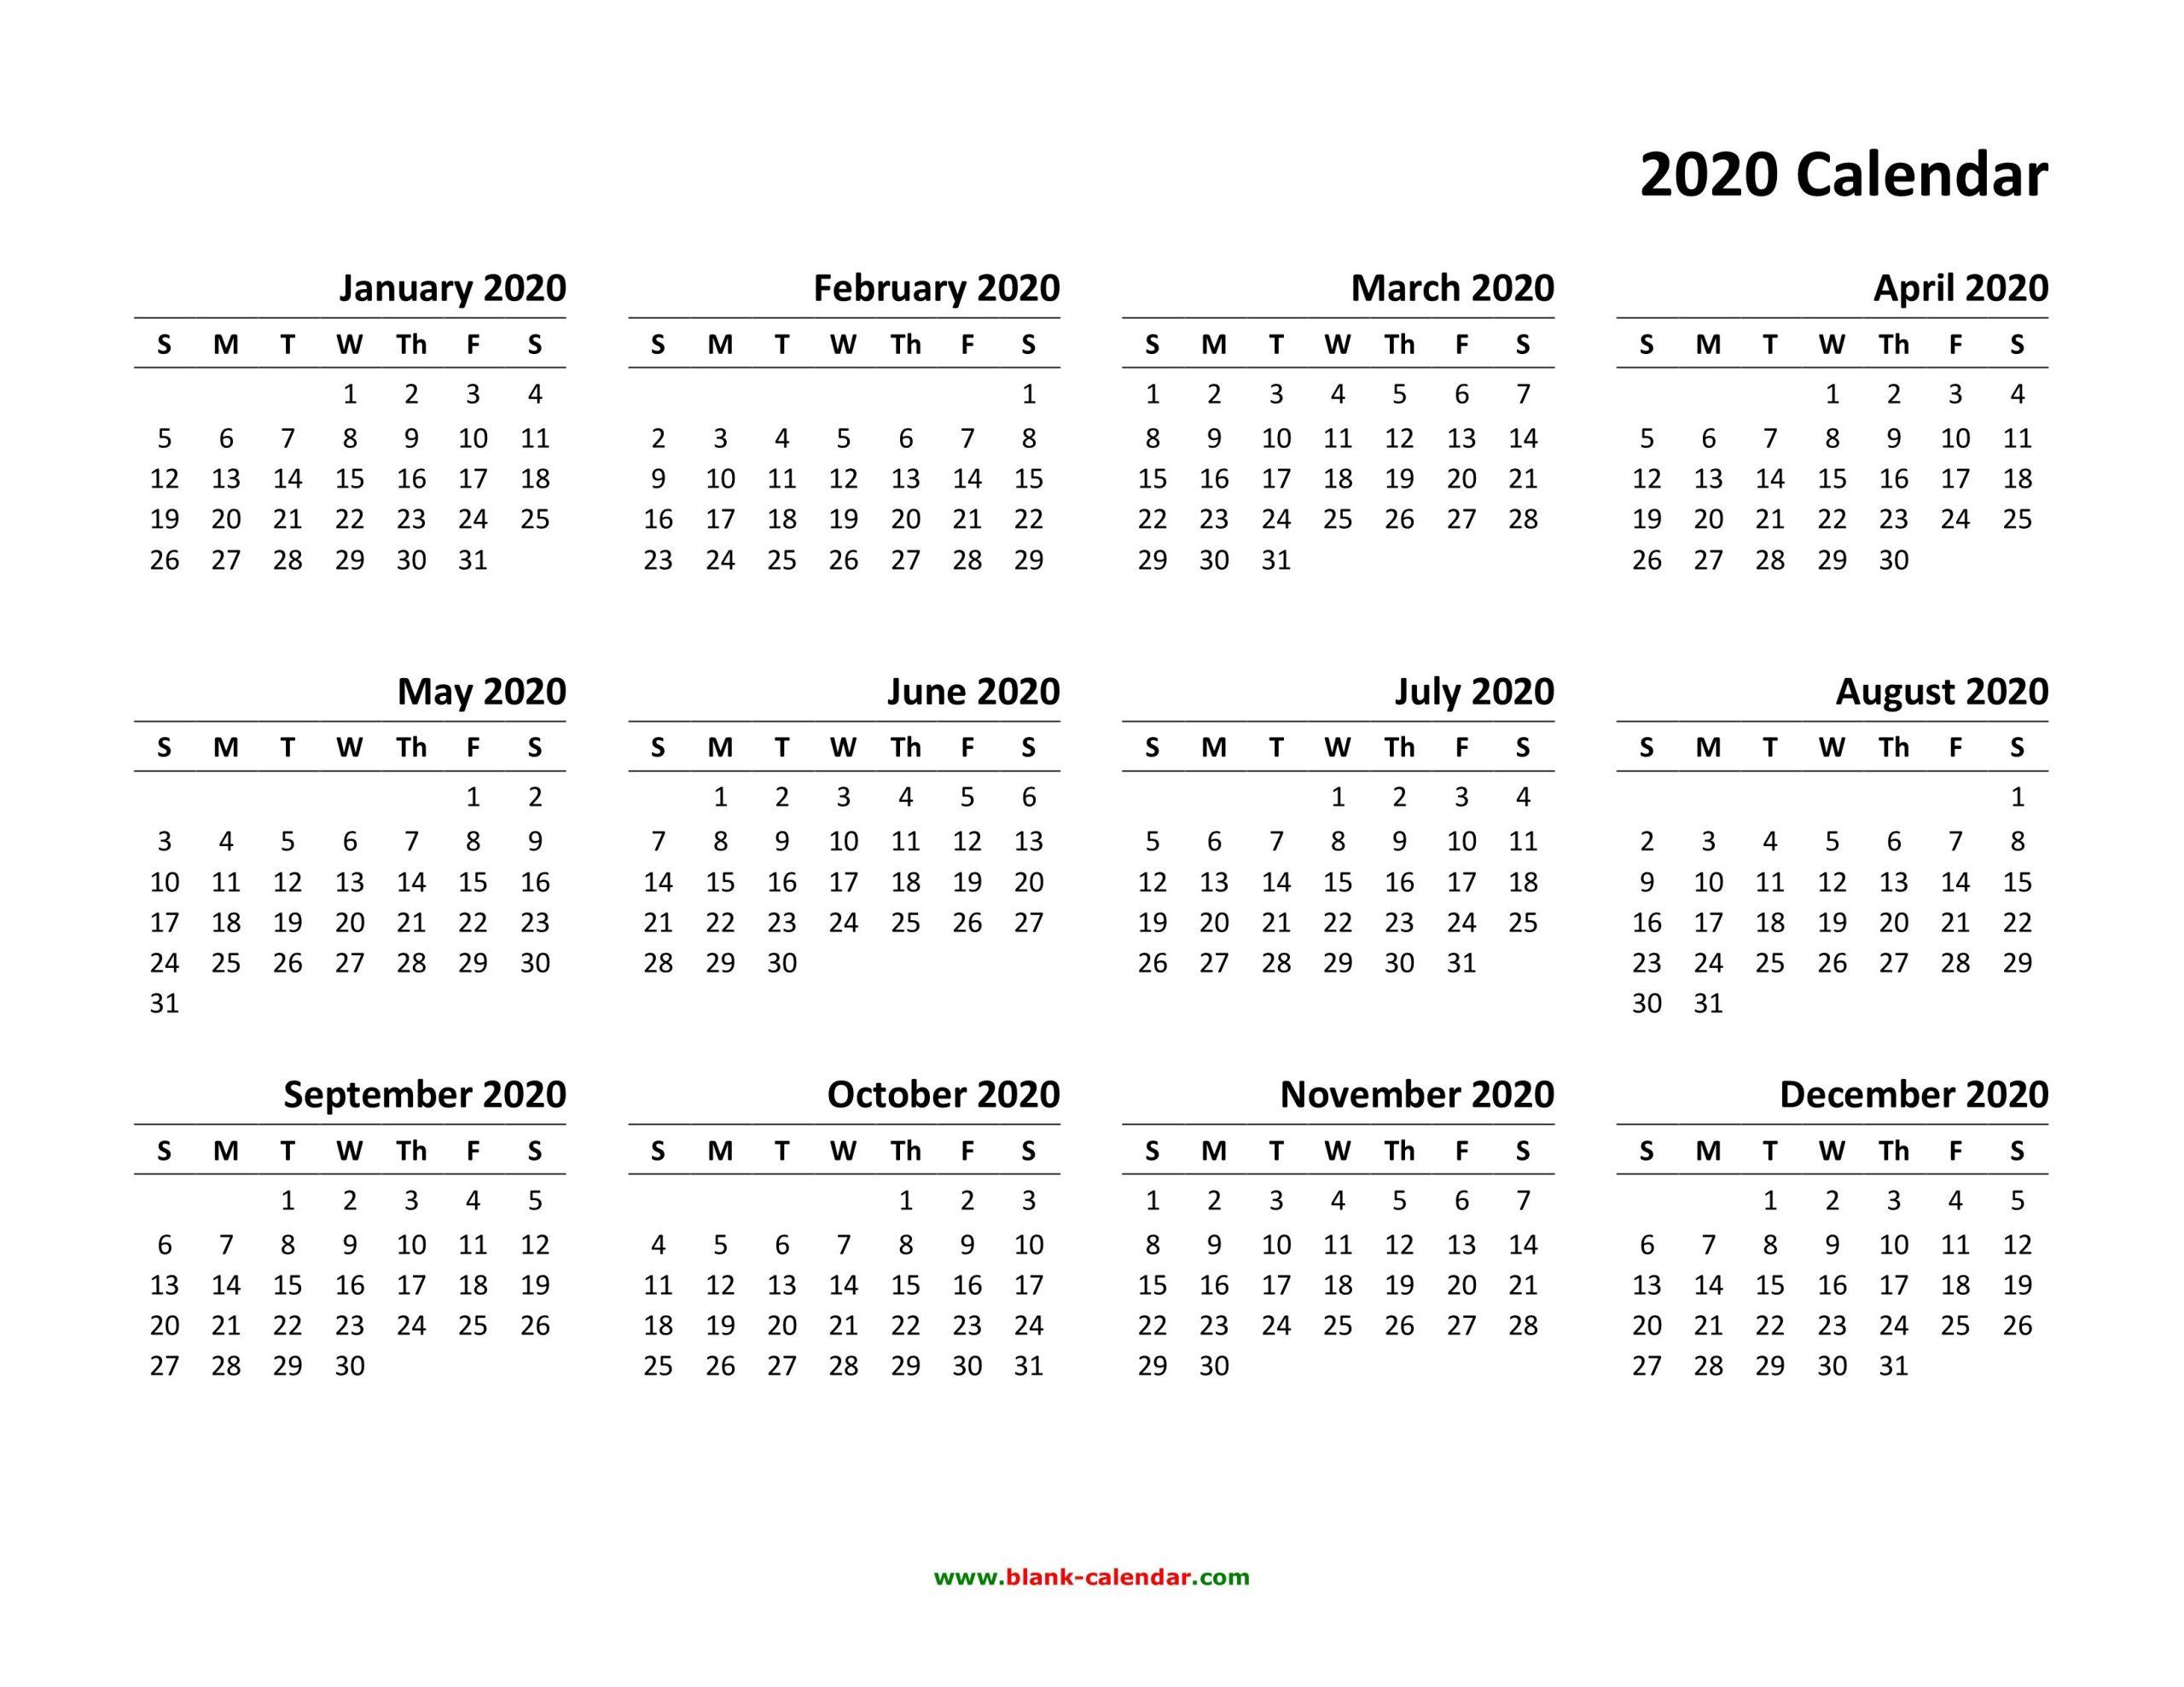 Free Printable 2020 Calendar To I Can Edit   Calendar Free Calendar I Can Edit